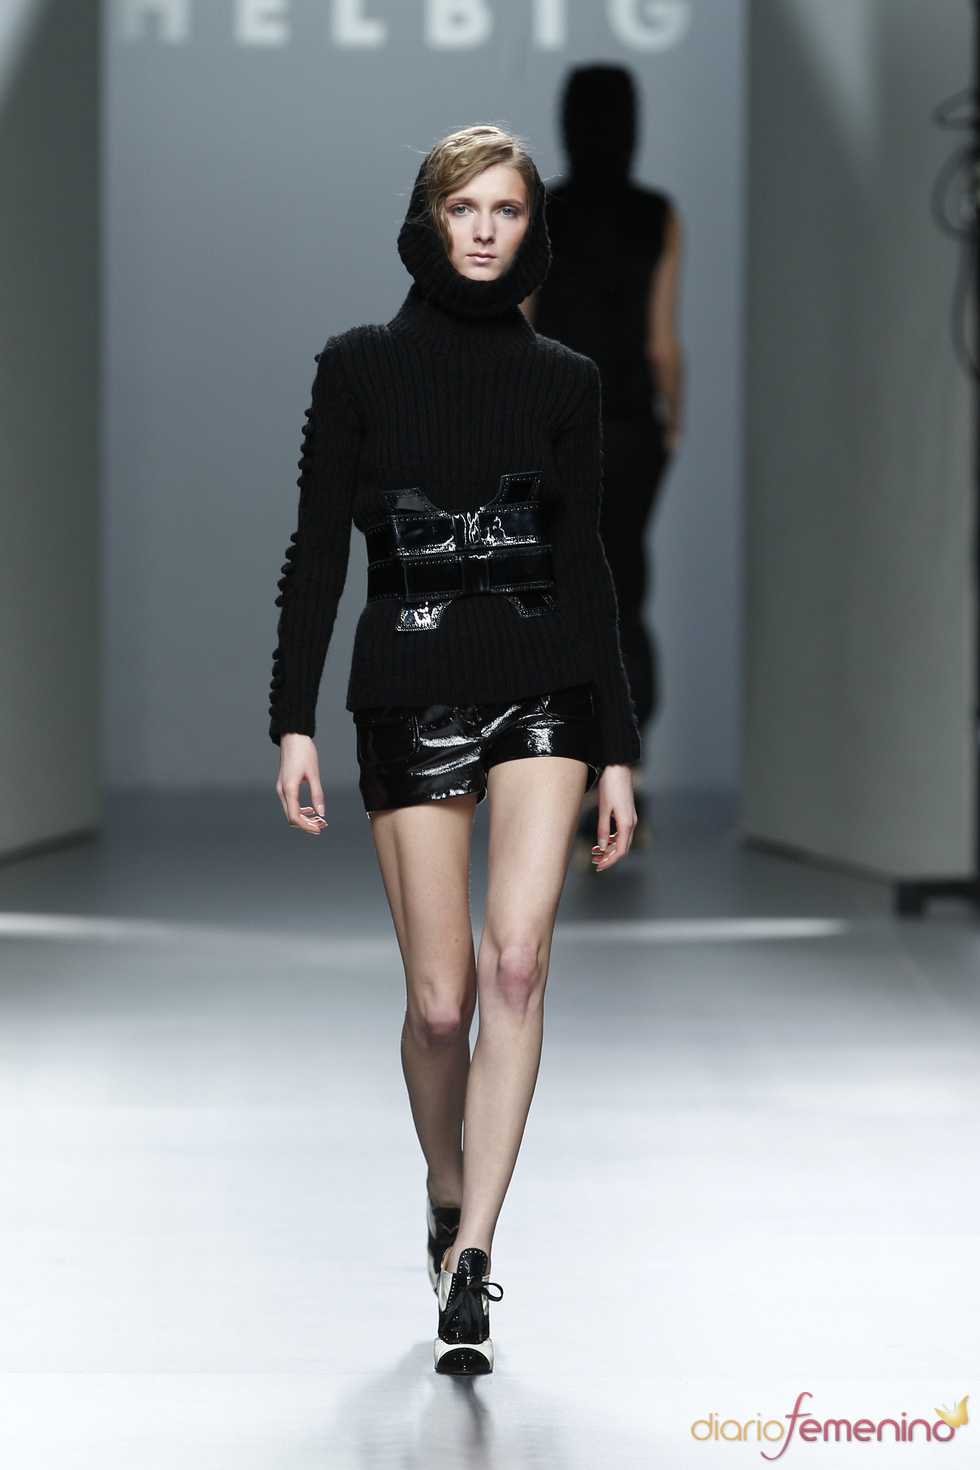 Cinturón a juego con short.Teresa Helbig O/I 2011-12. Cibeles Madrid Fashion Week